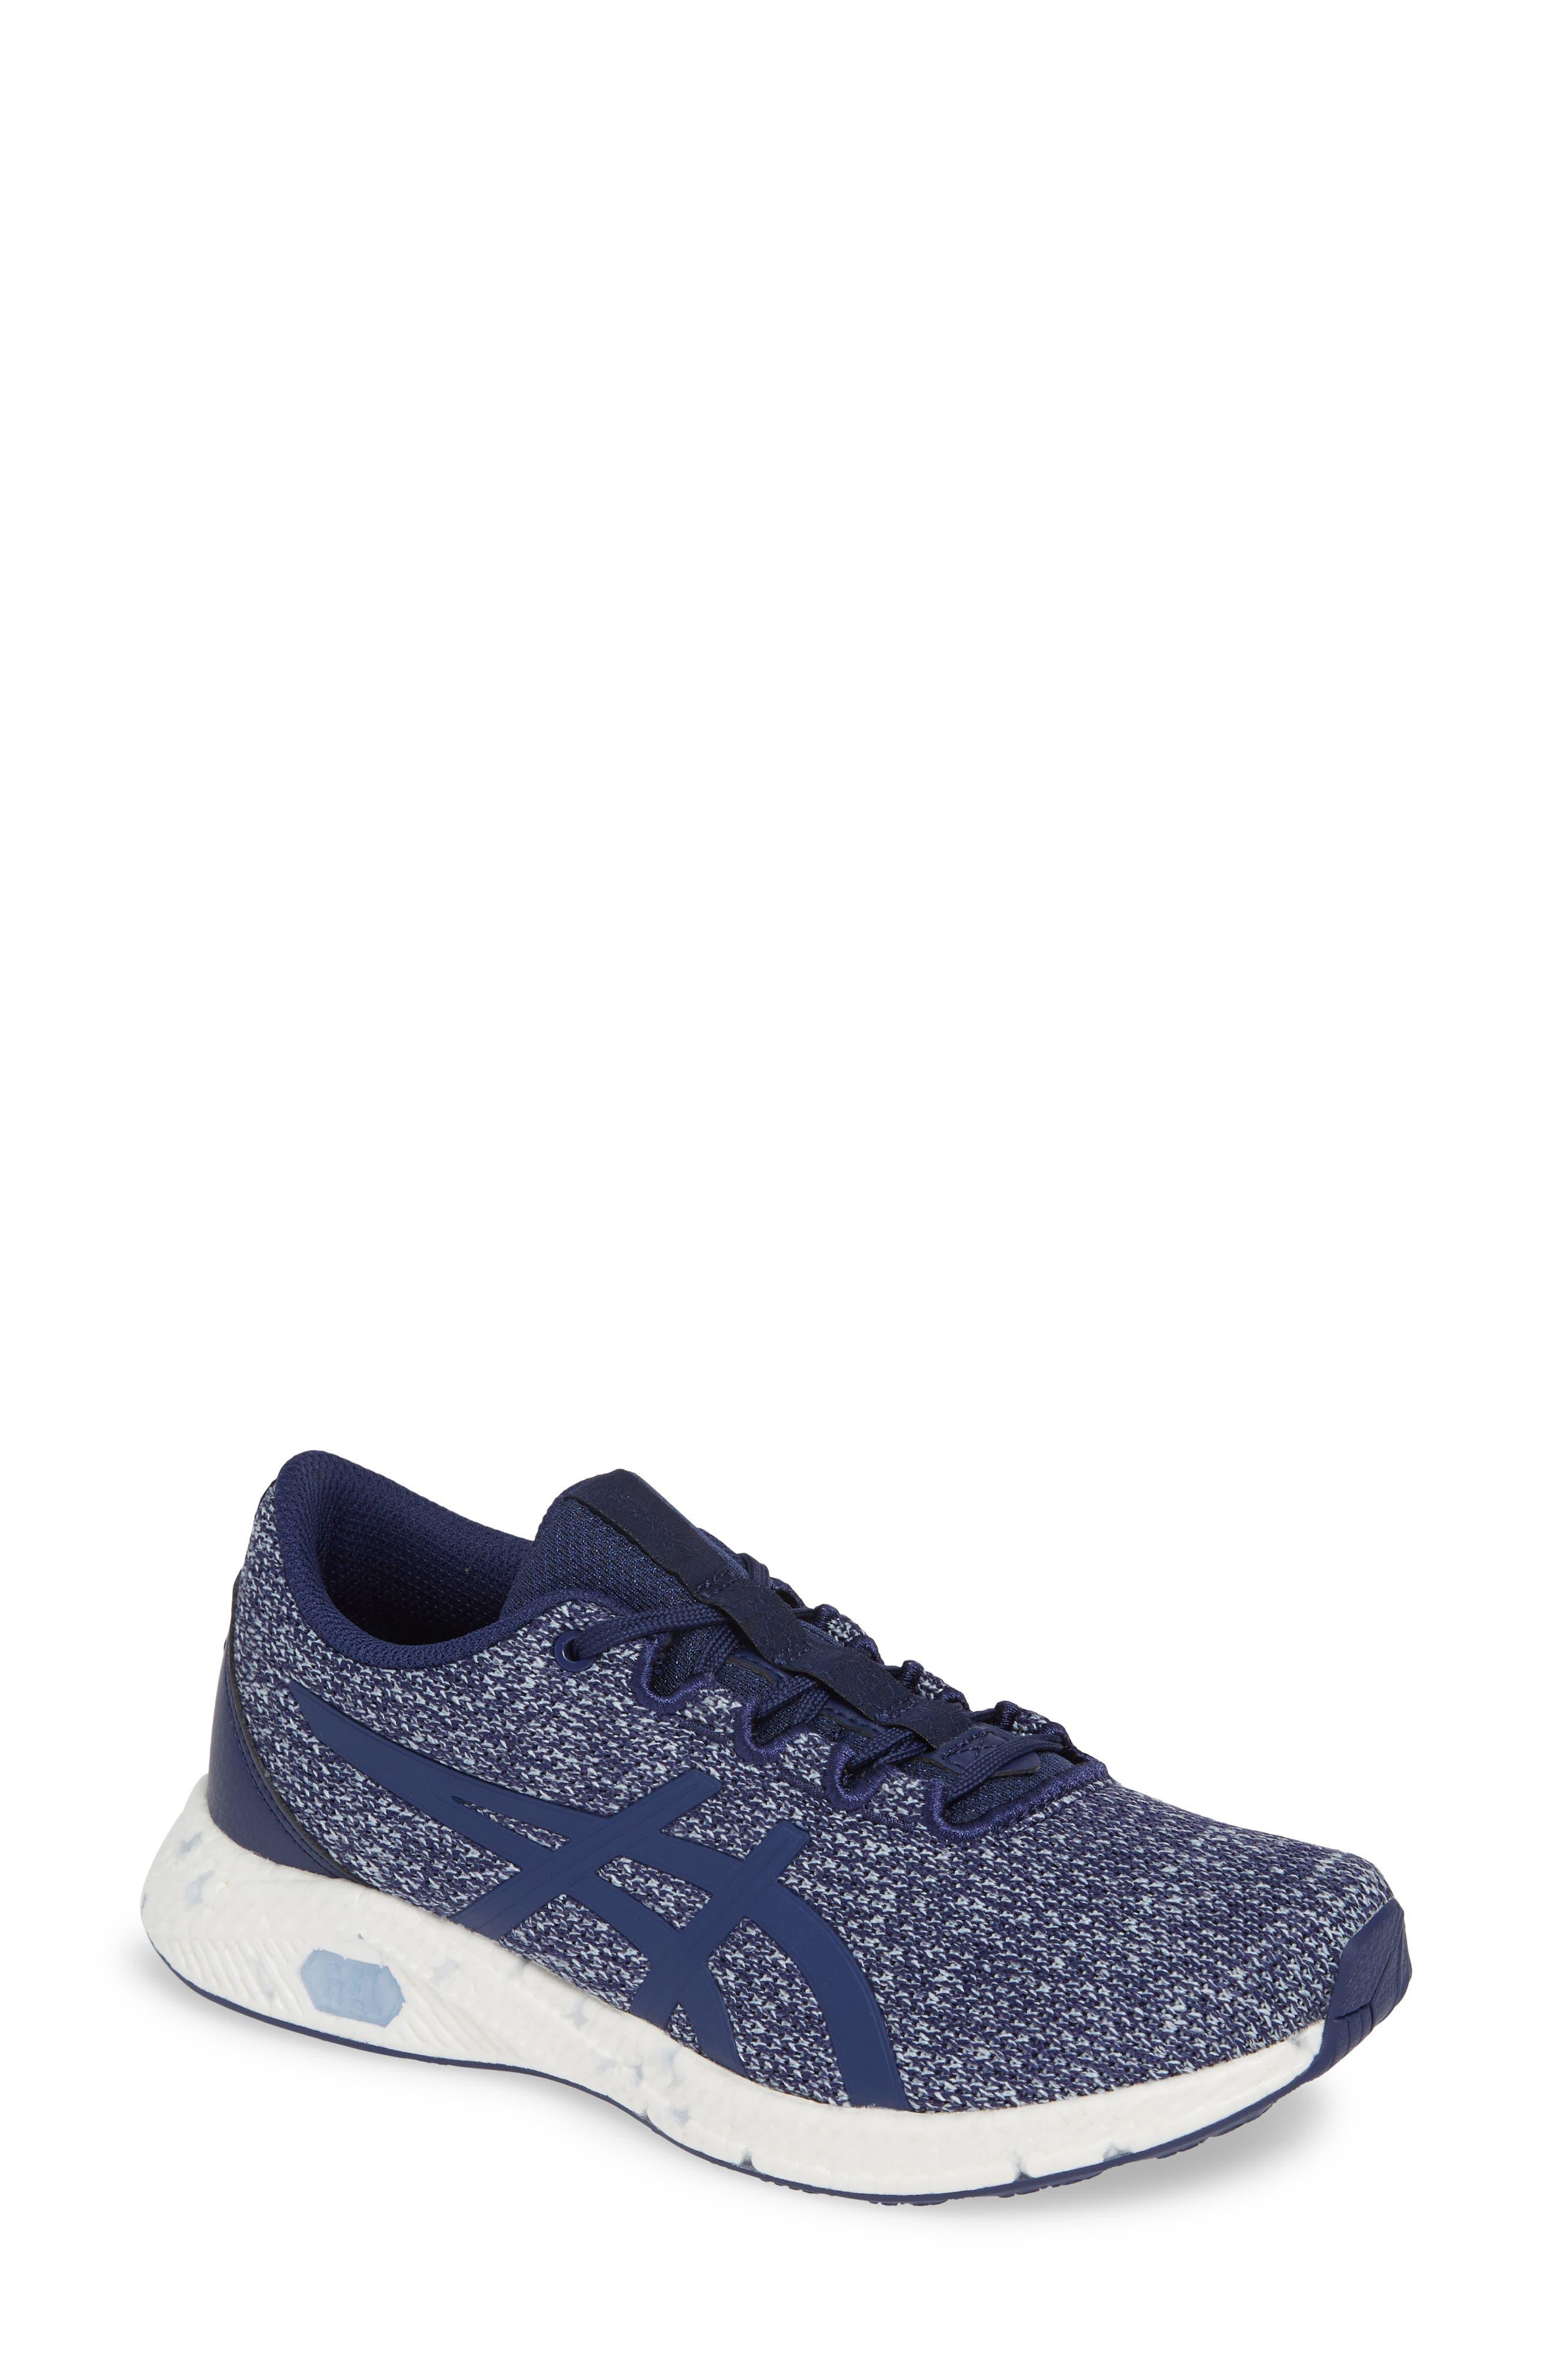 Asics Hypergel-Yu Running Shoe, Blue